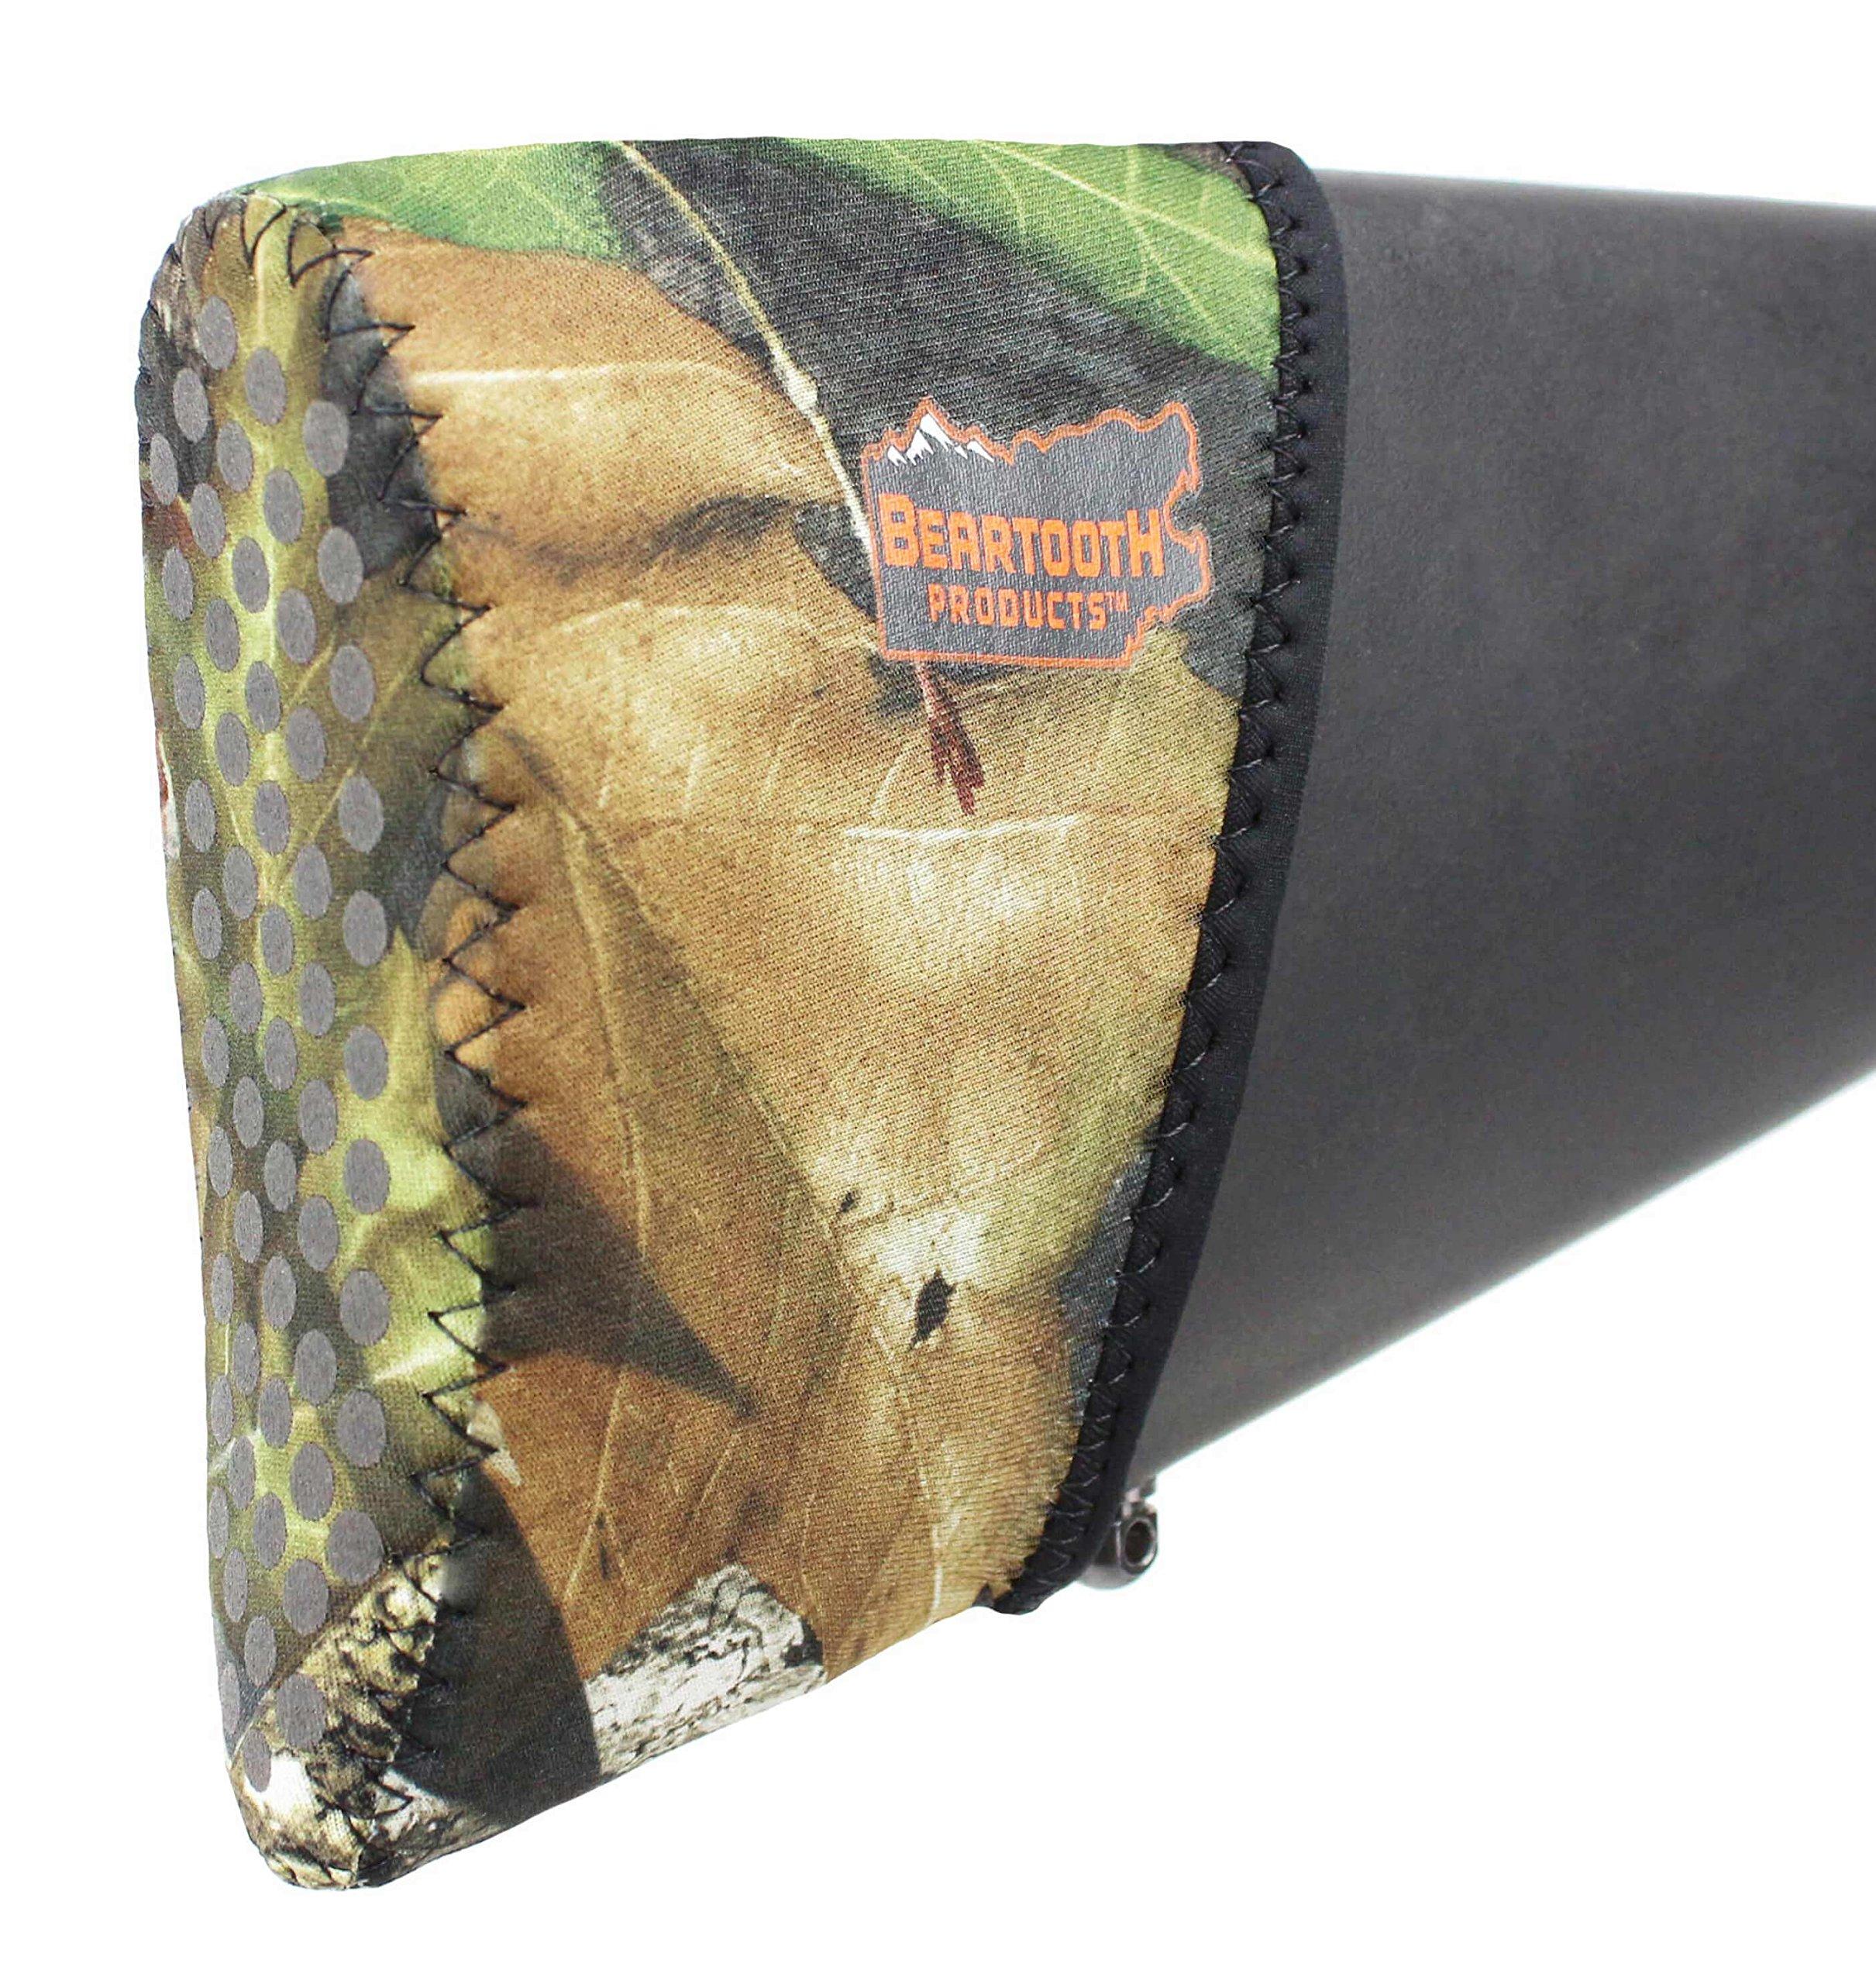 Beartooth Recoil Pad Kit 2.0 (Mossy Oak Break-up) by Beartooth